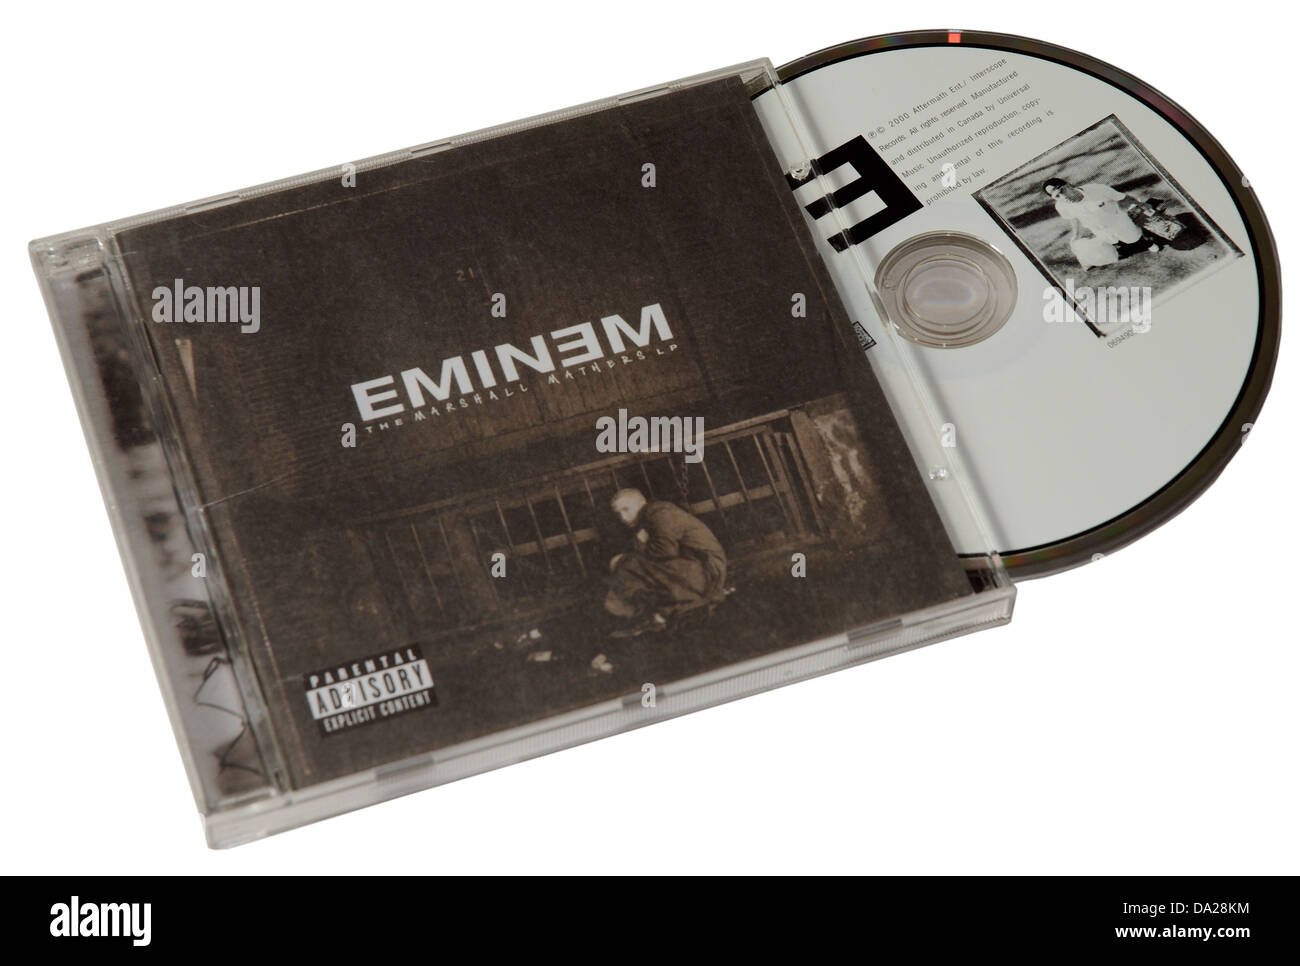 Eminem The Marshall Mathers LP on CD - Stock Image